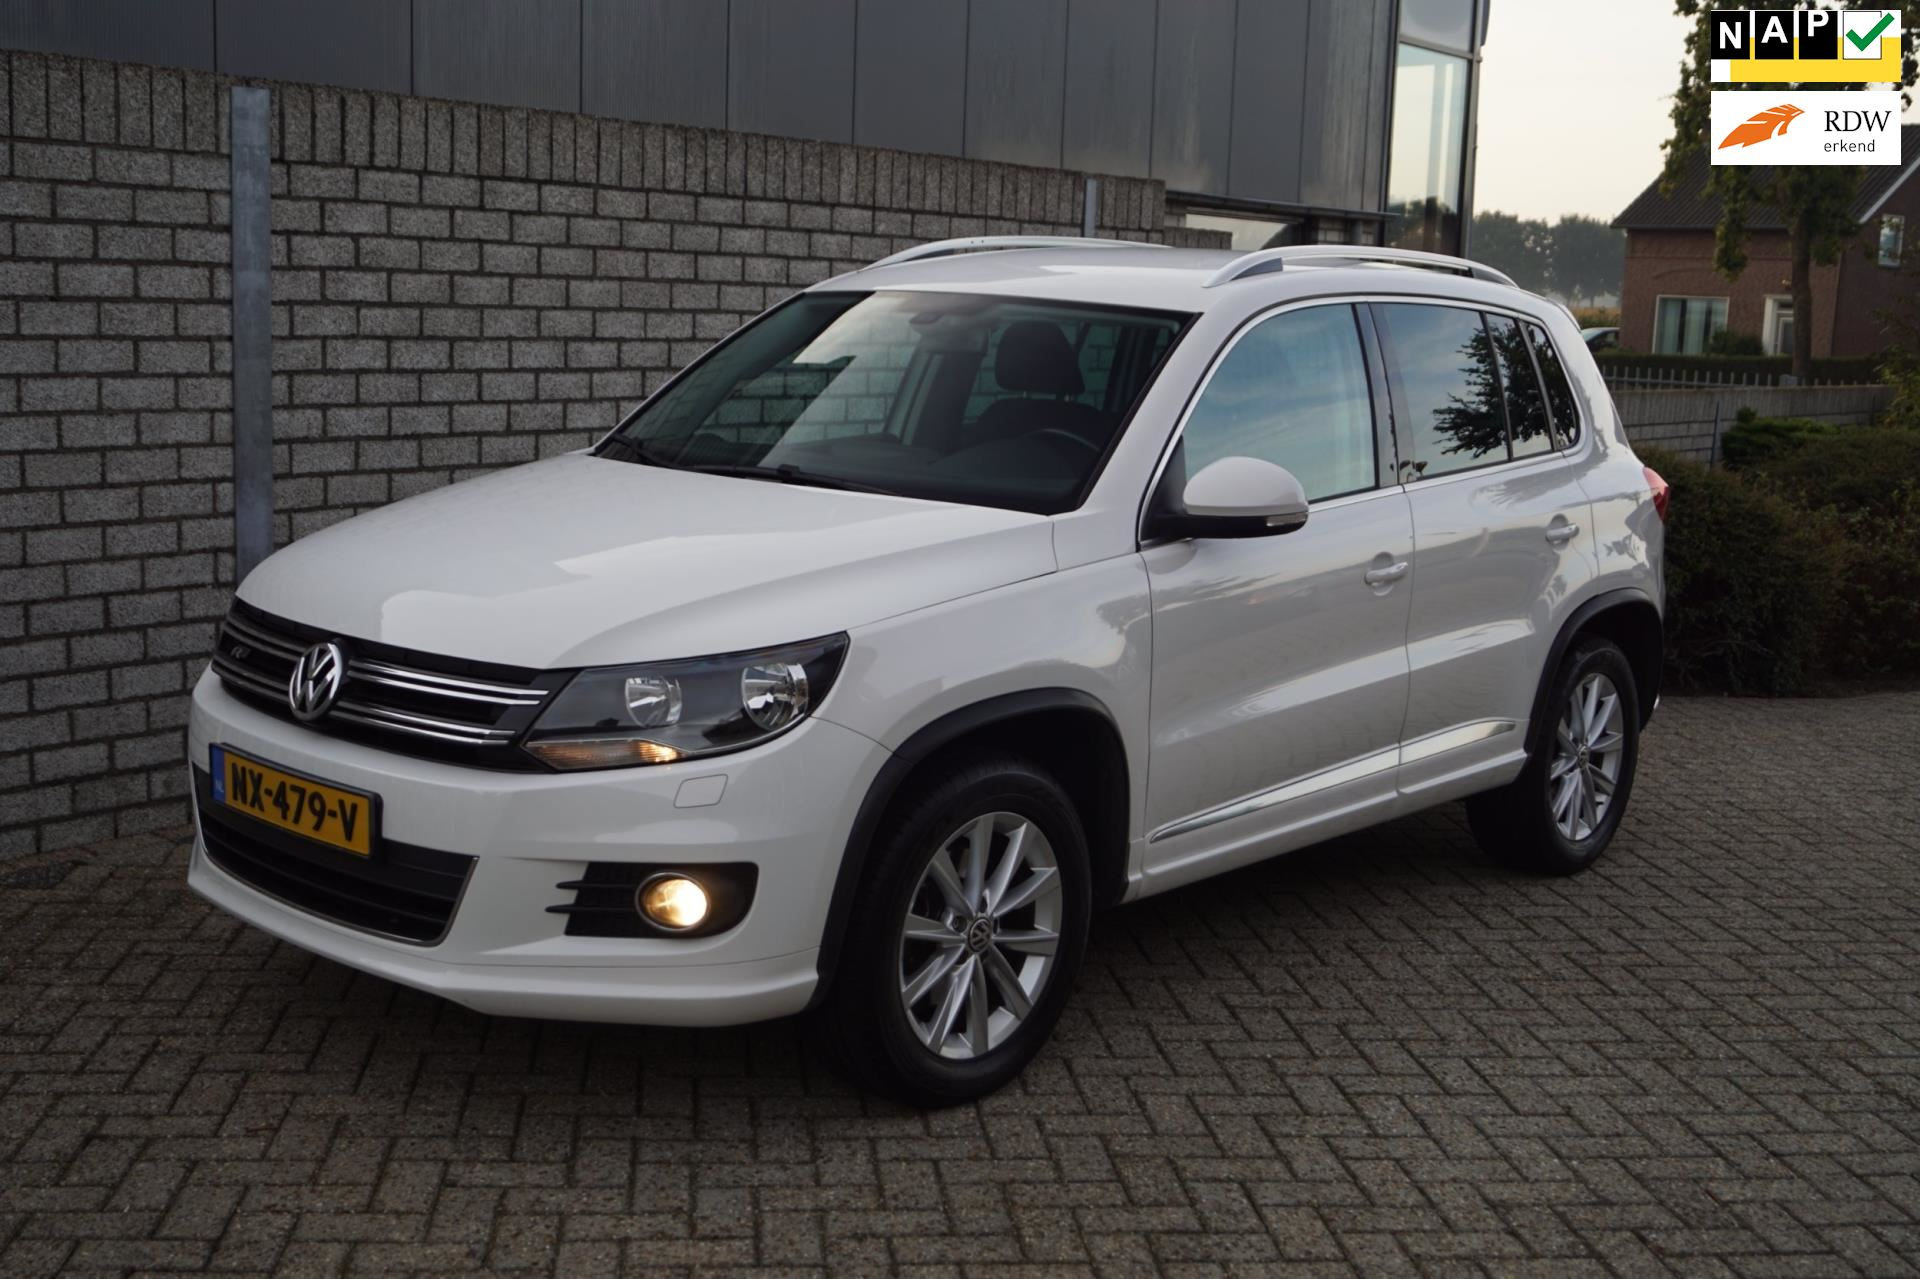 Volkswagen Tiguan occasion - Autobedrijf H. Wijdeven V.o.f.